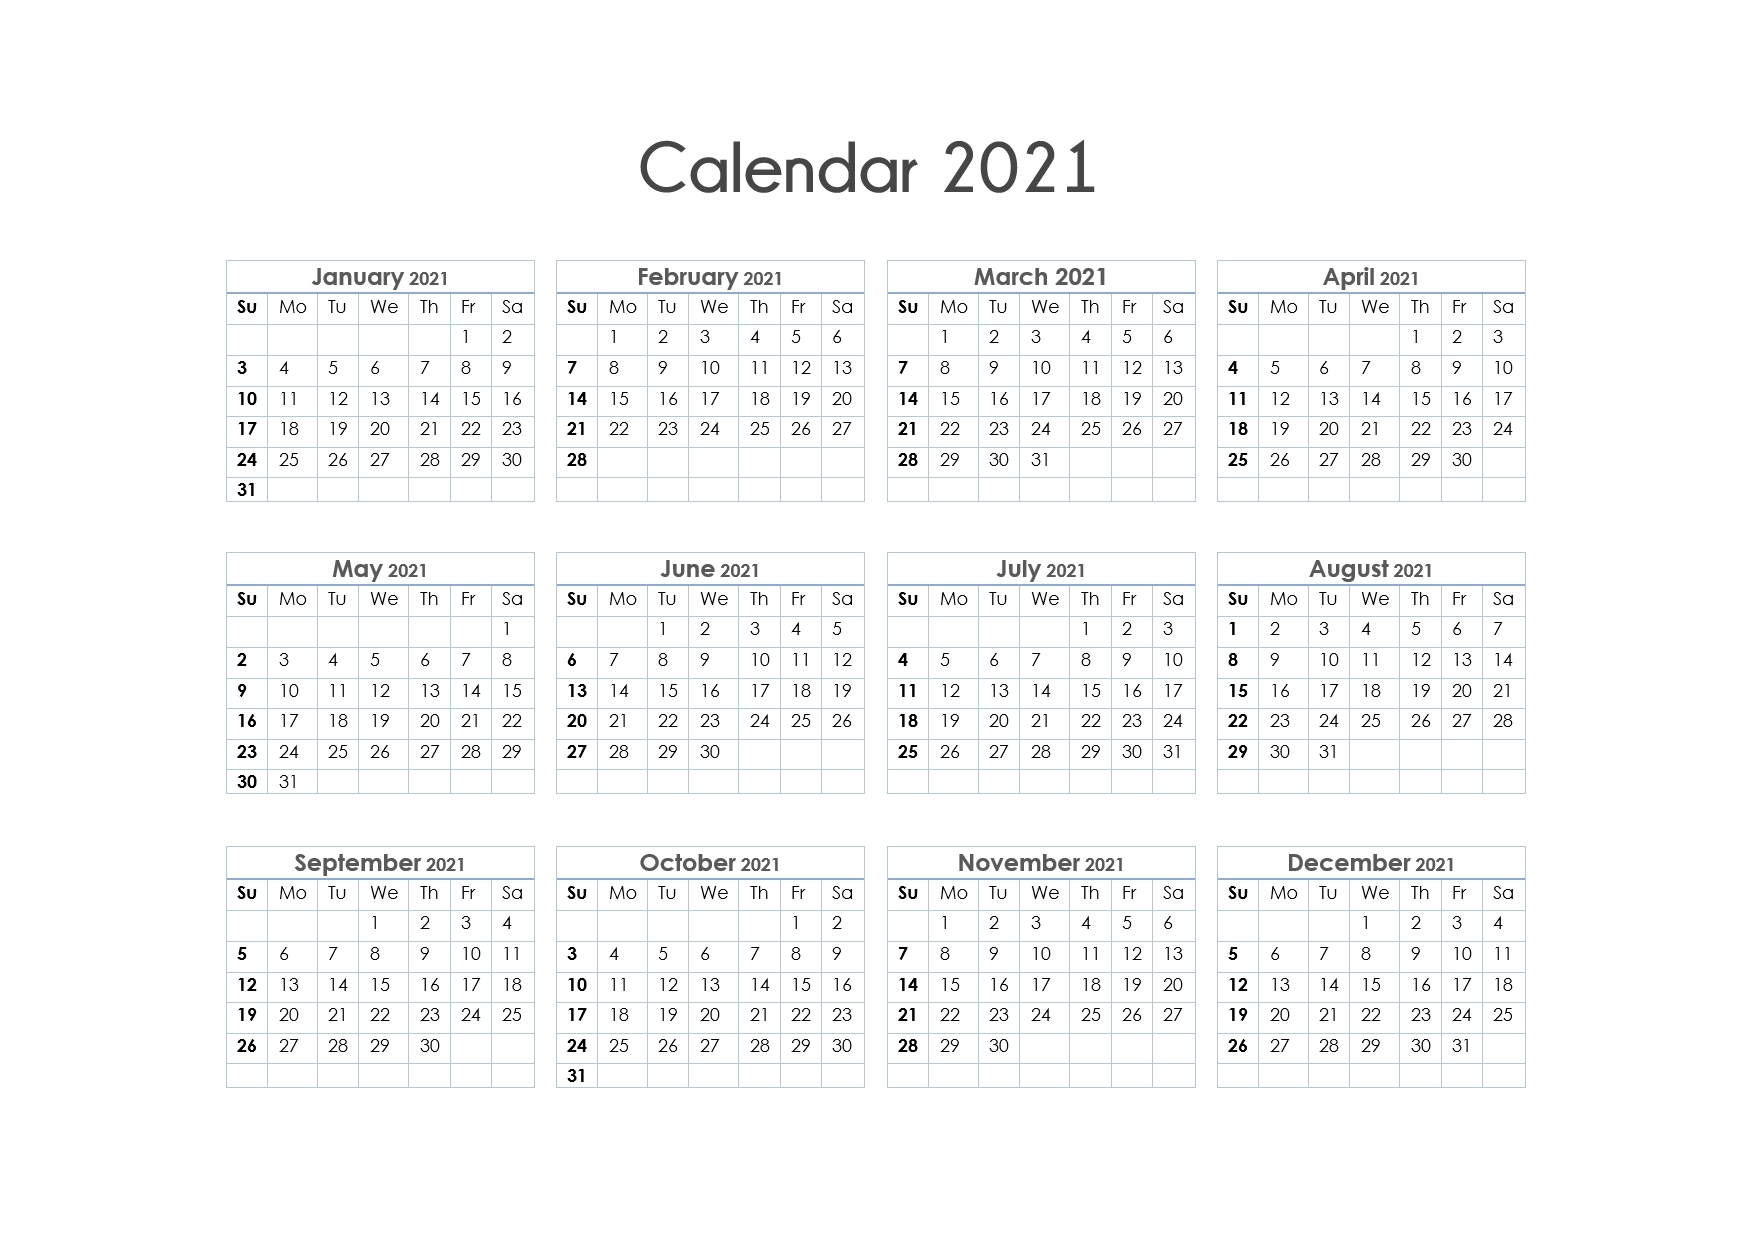 Free Printable Calendar Year 2021 | Month Calendar Printable pertaining to Free Printable Yearly Calendars 2021 Portrait